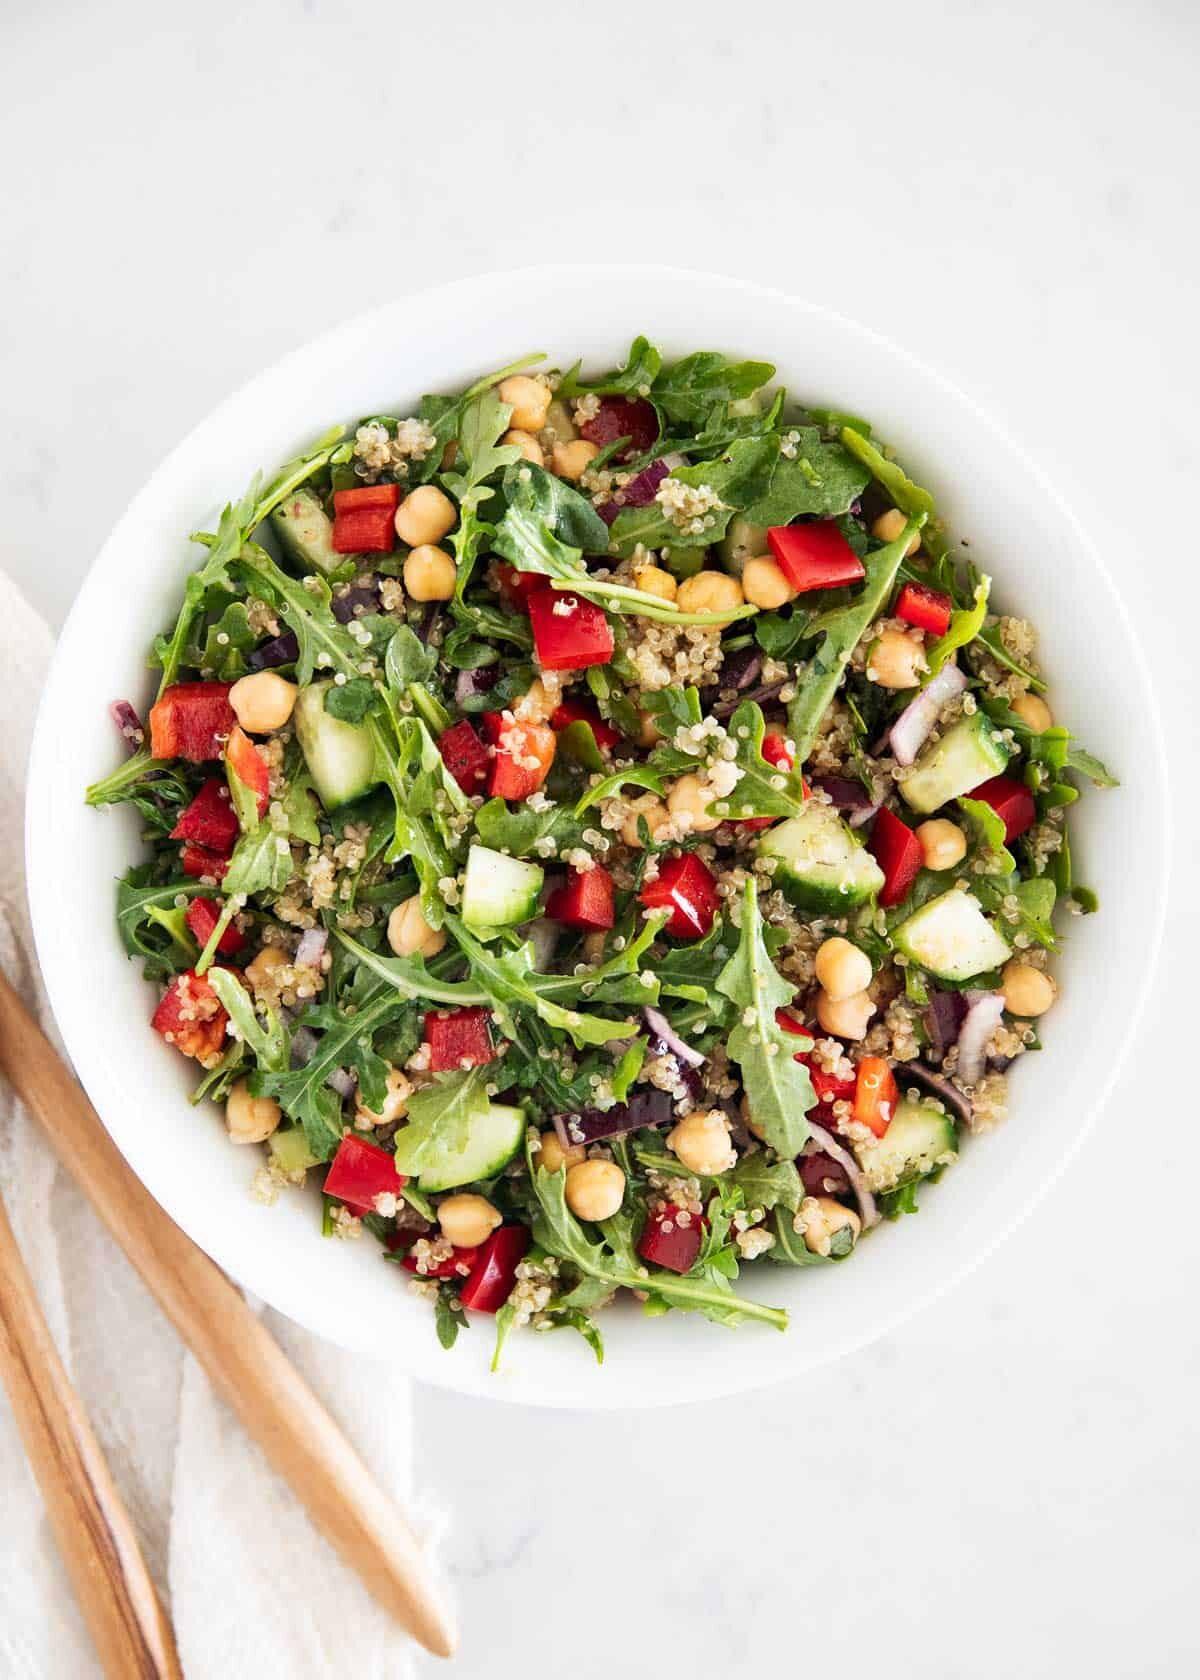 https://www.iheartnaptime.net/wp-content/uploads/2021/04/IHeartNaptime-quinoa-mediterranean-salad-5-e1618863952679.jpg